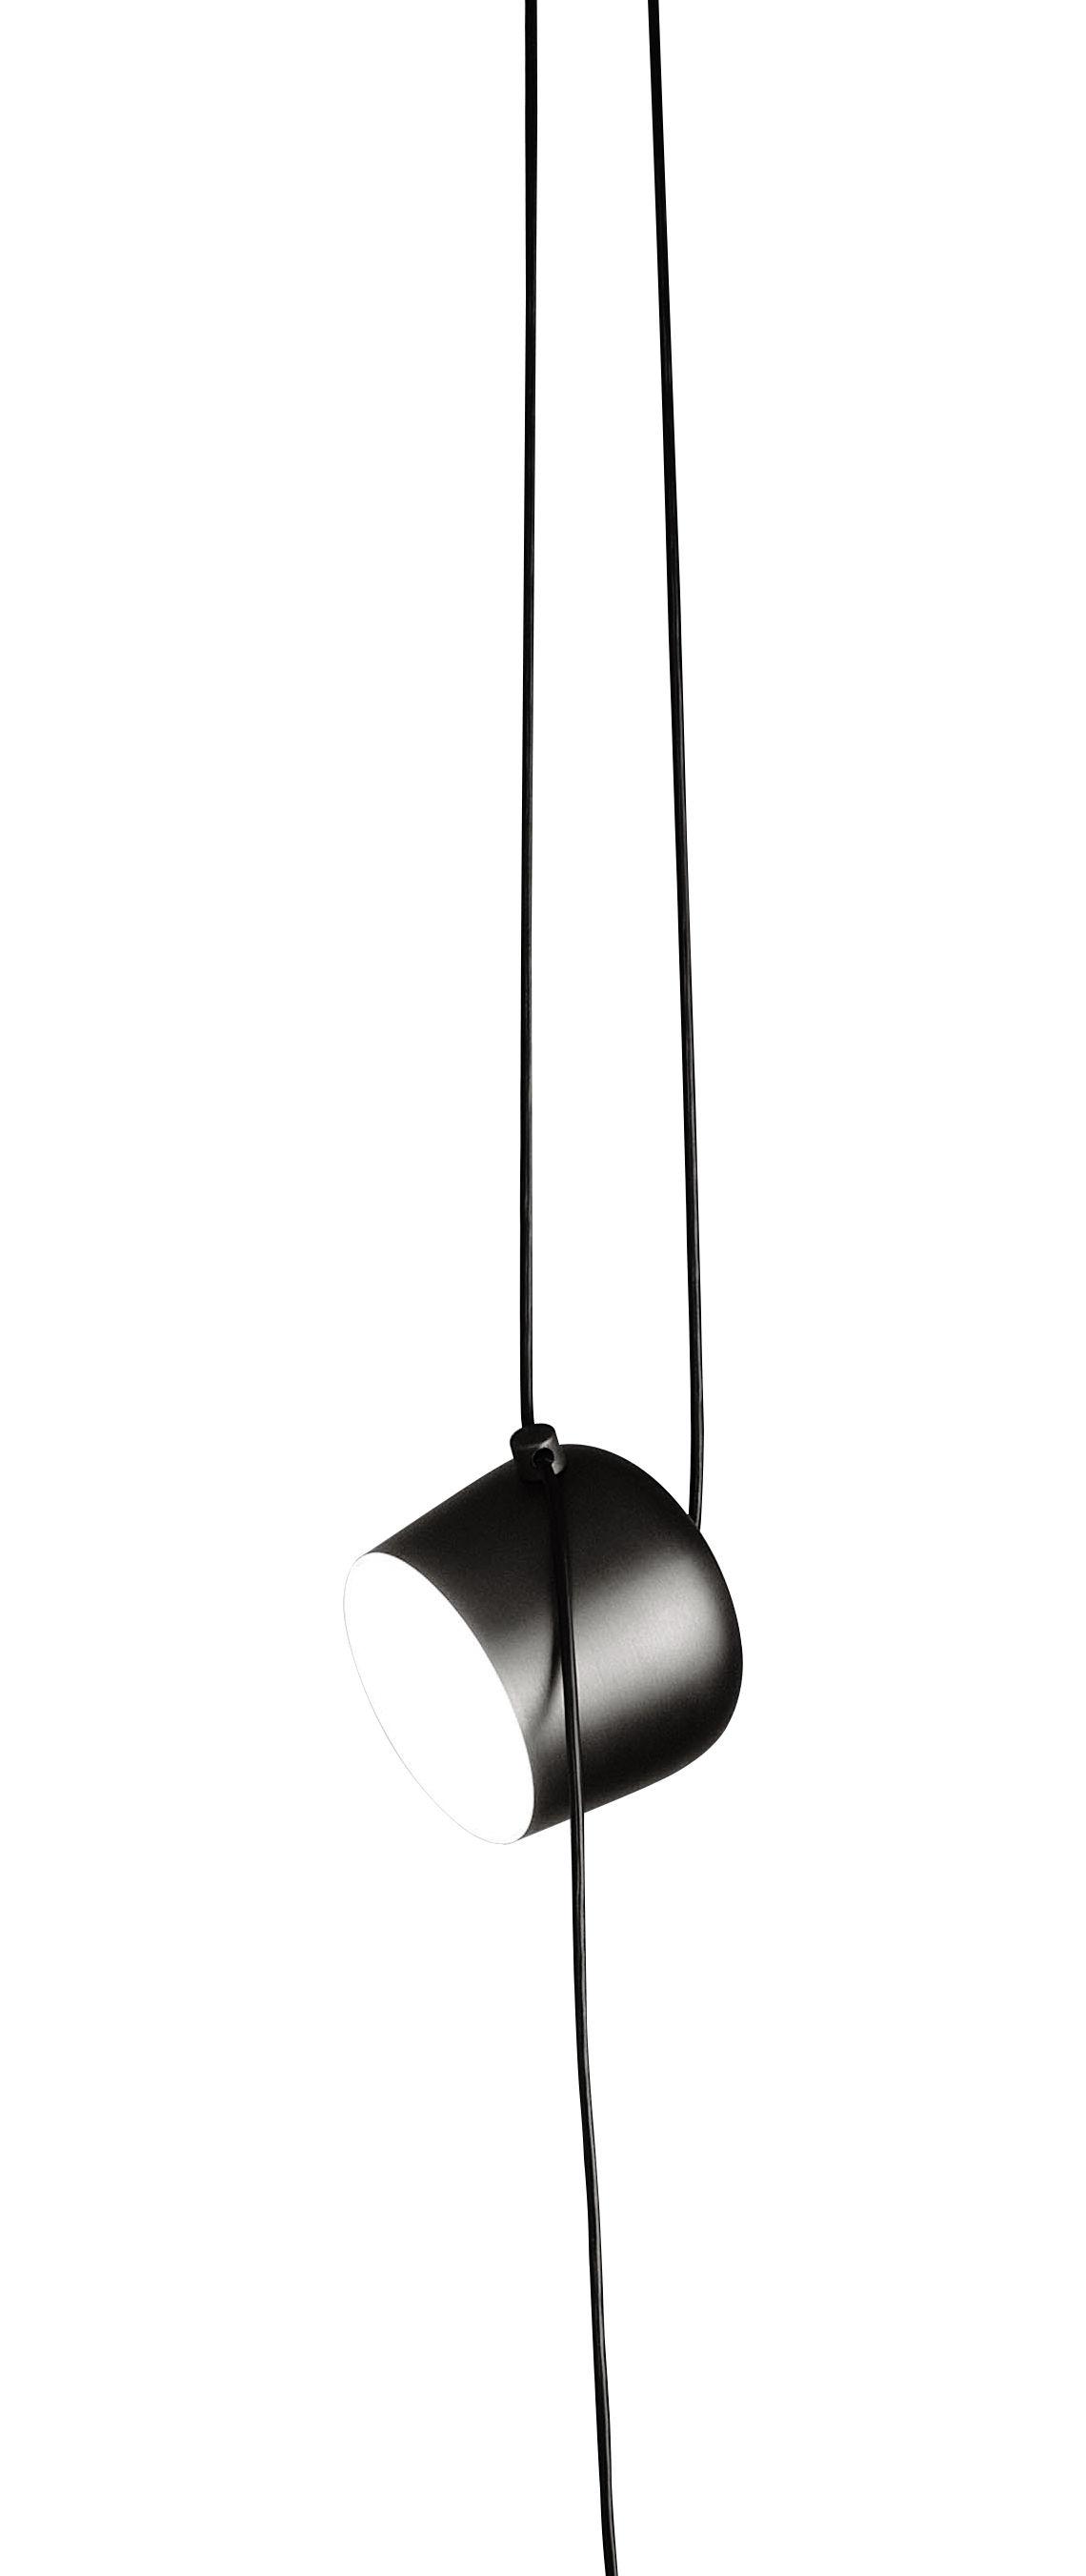 Lighting - Pendant Lighting - AIM Small Pendant - LED - Ø 17 cm by Flos - Black - Aluminium, Polycarbonate